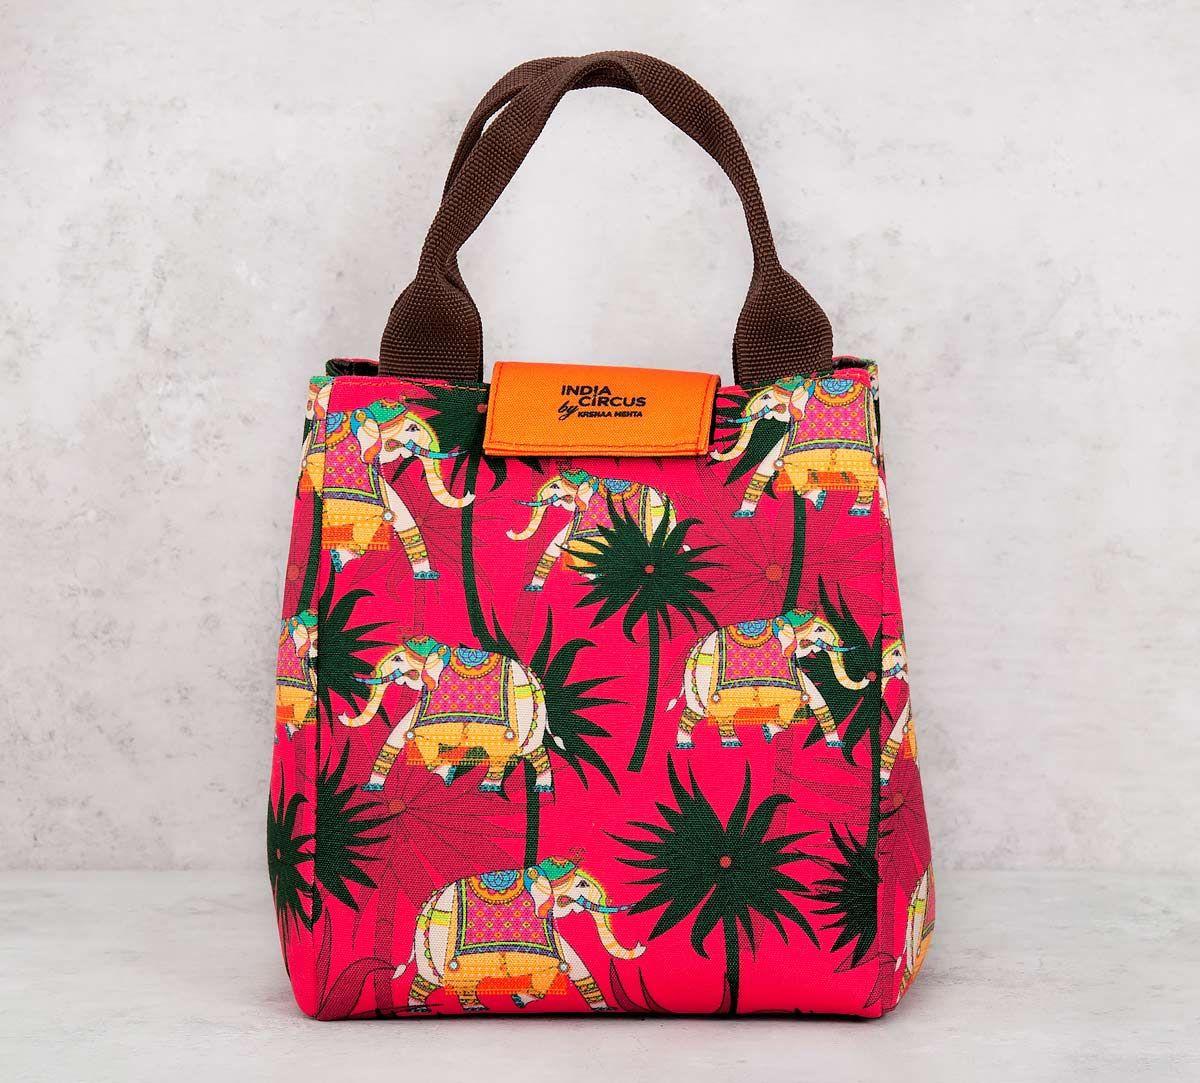 India Circus Mastodon's Junket Lunch Bag